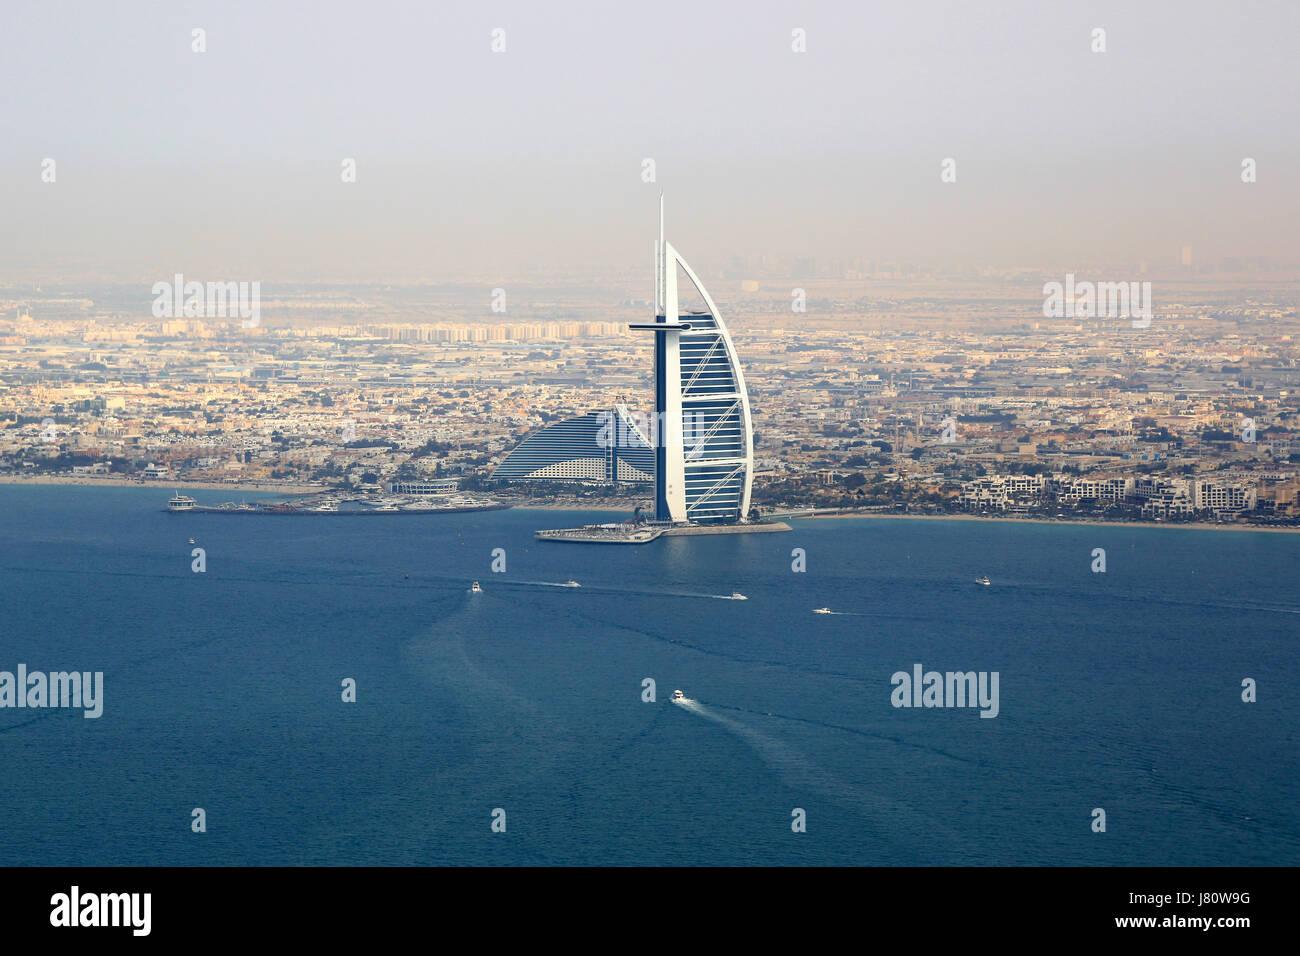 Dubai burj al arab hotel mar vista aérea fotografía eau Imagen De Stock